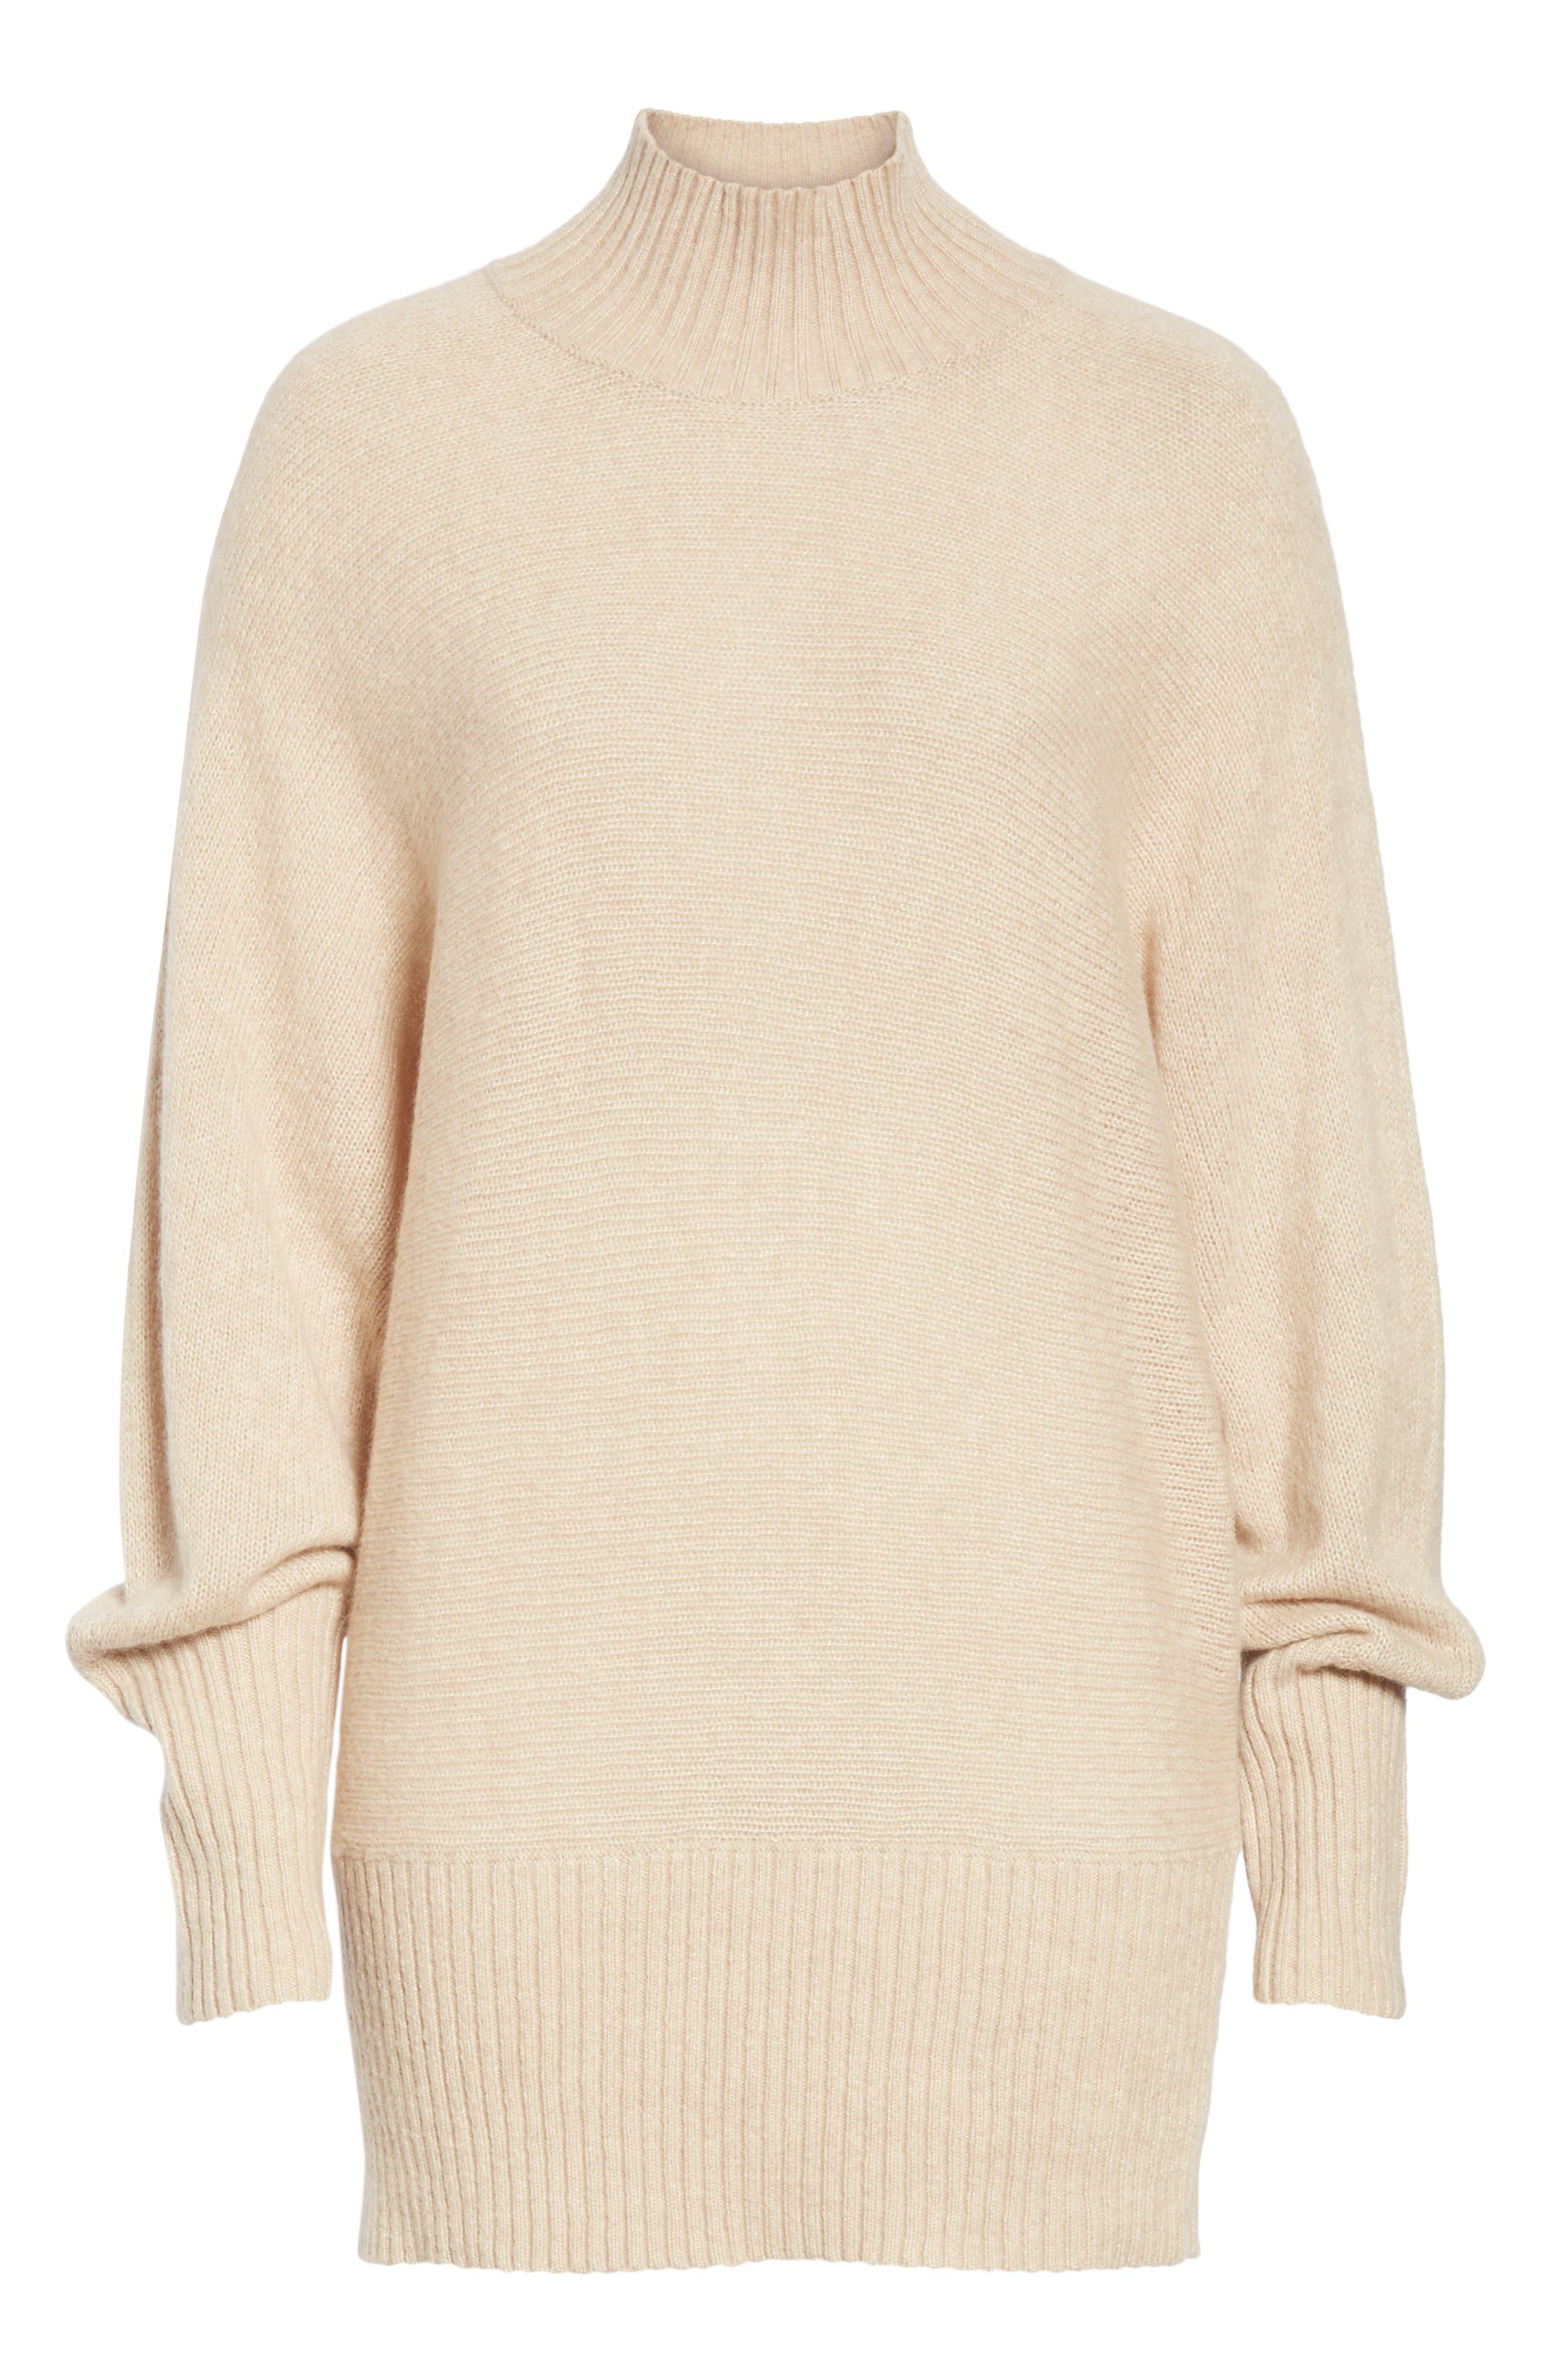 Cashmere Blend Dolman Sweater,                             Alternate thumbnail 6, color,                             250